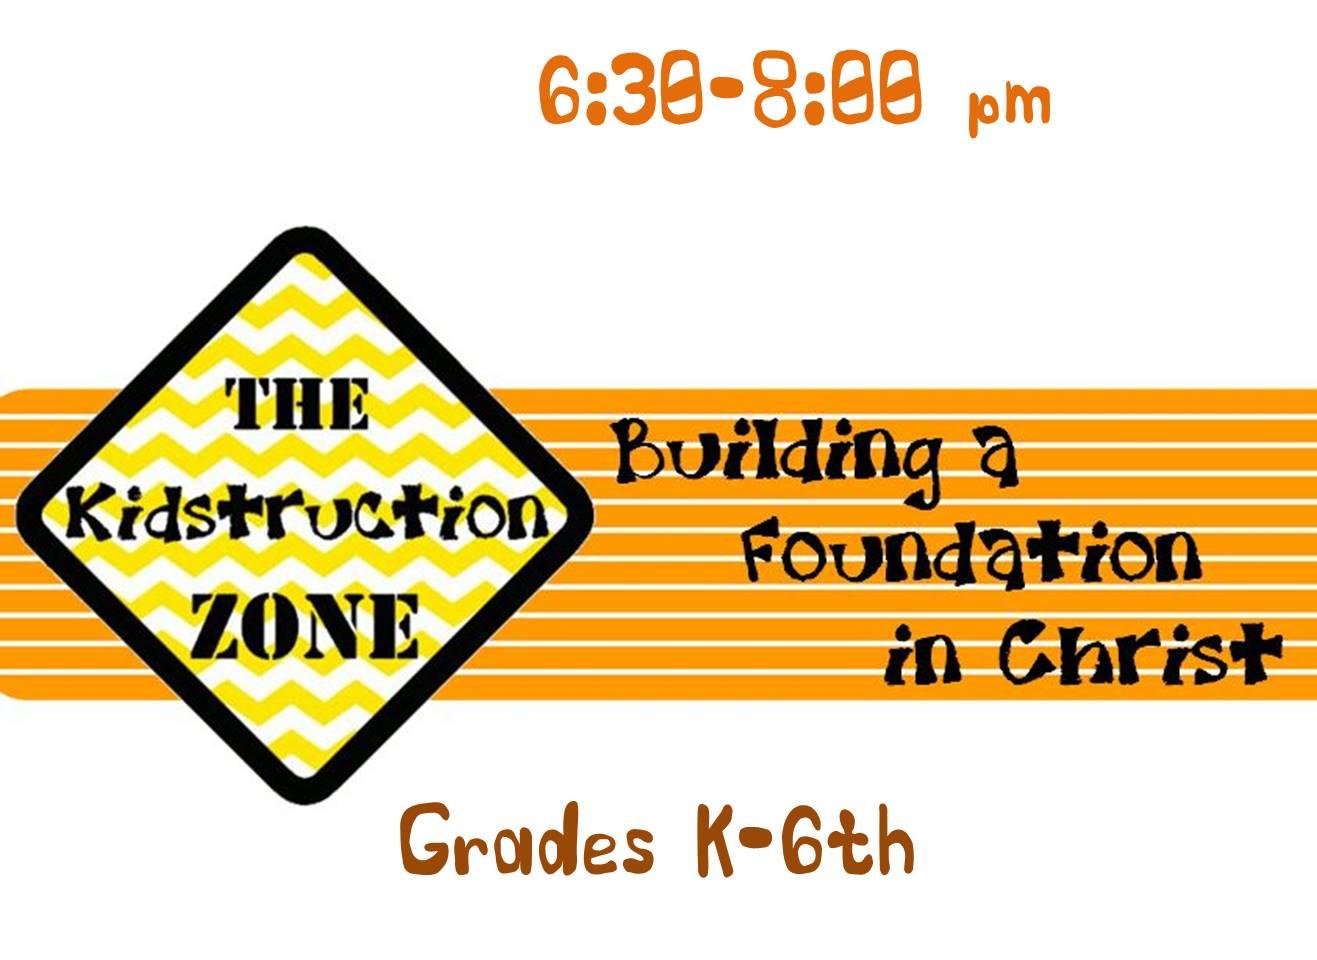 Kidstruction Zone.jpg